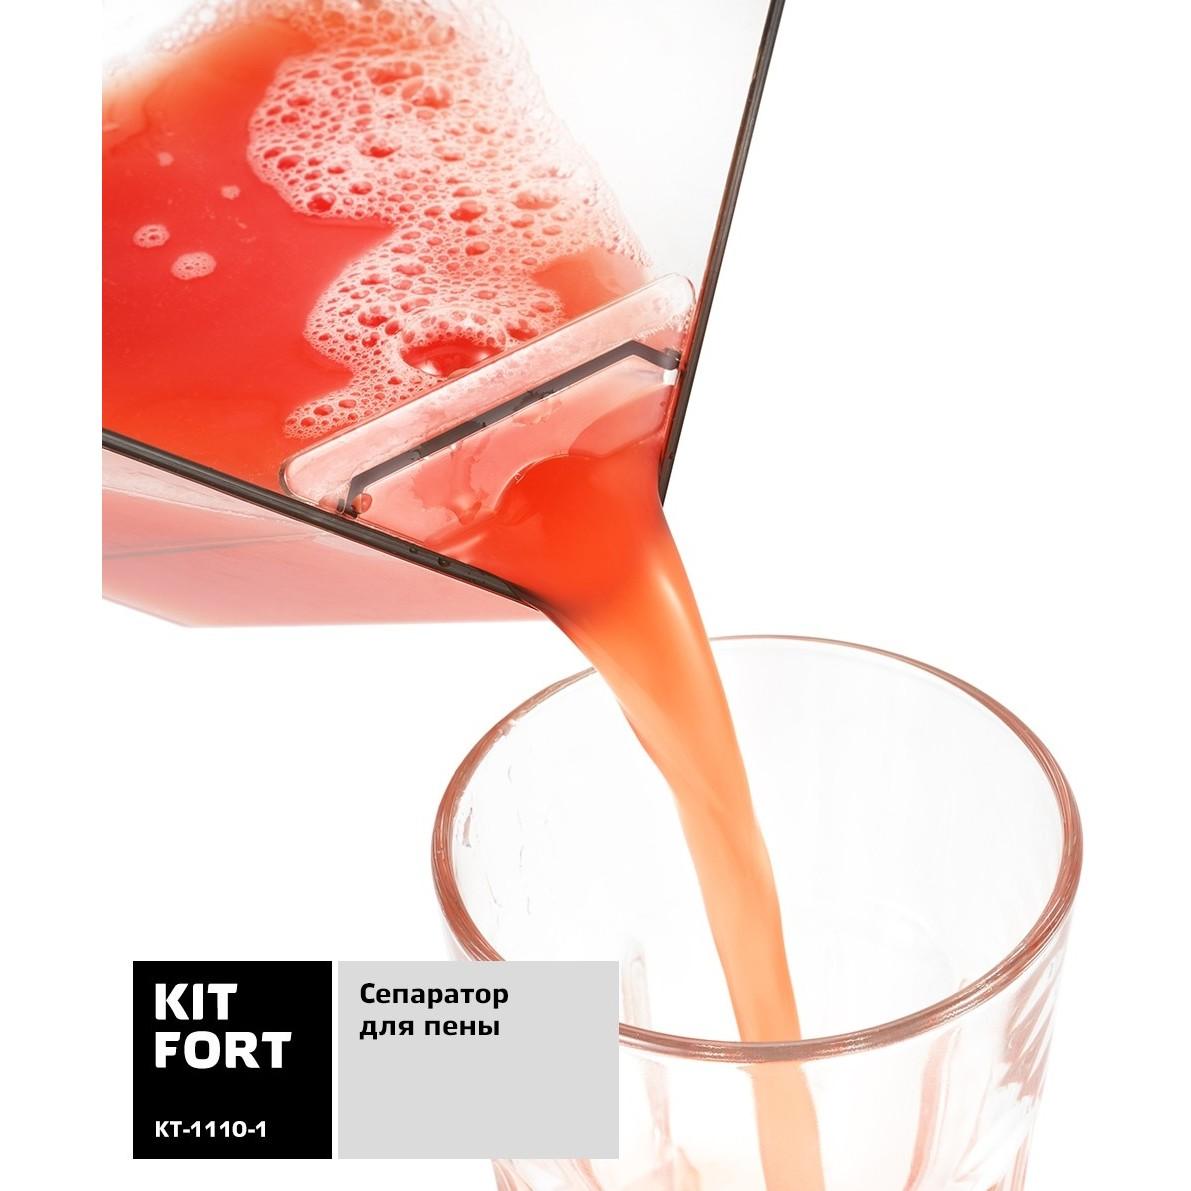 Соковыжималка KITFORT KT-1110